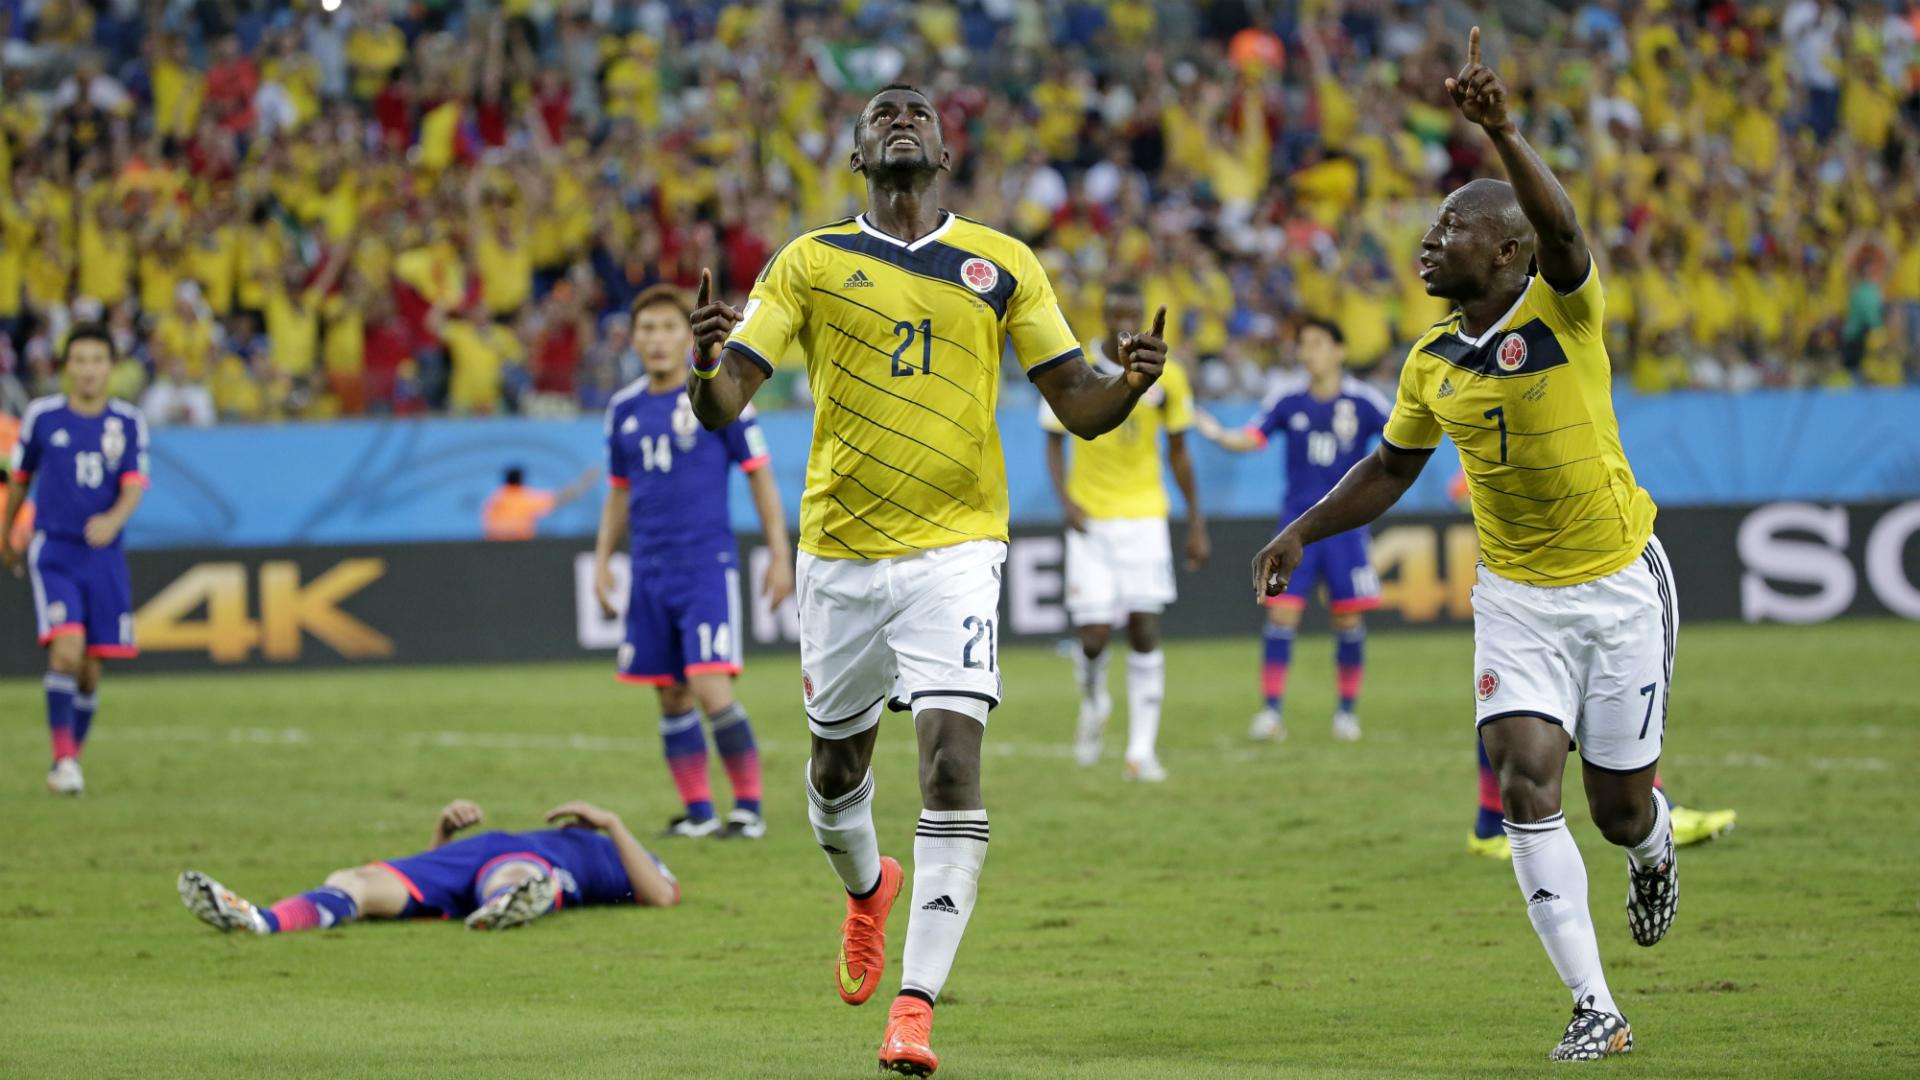 Colombia-Soccer-6-24-2014-AP-FTR